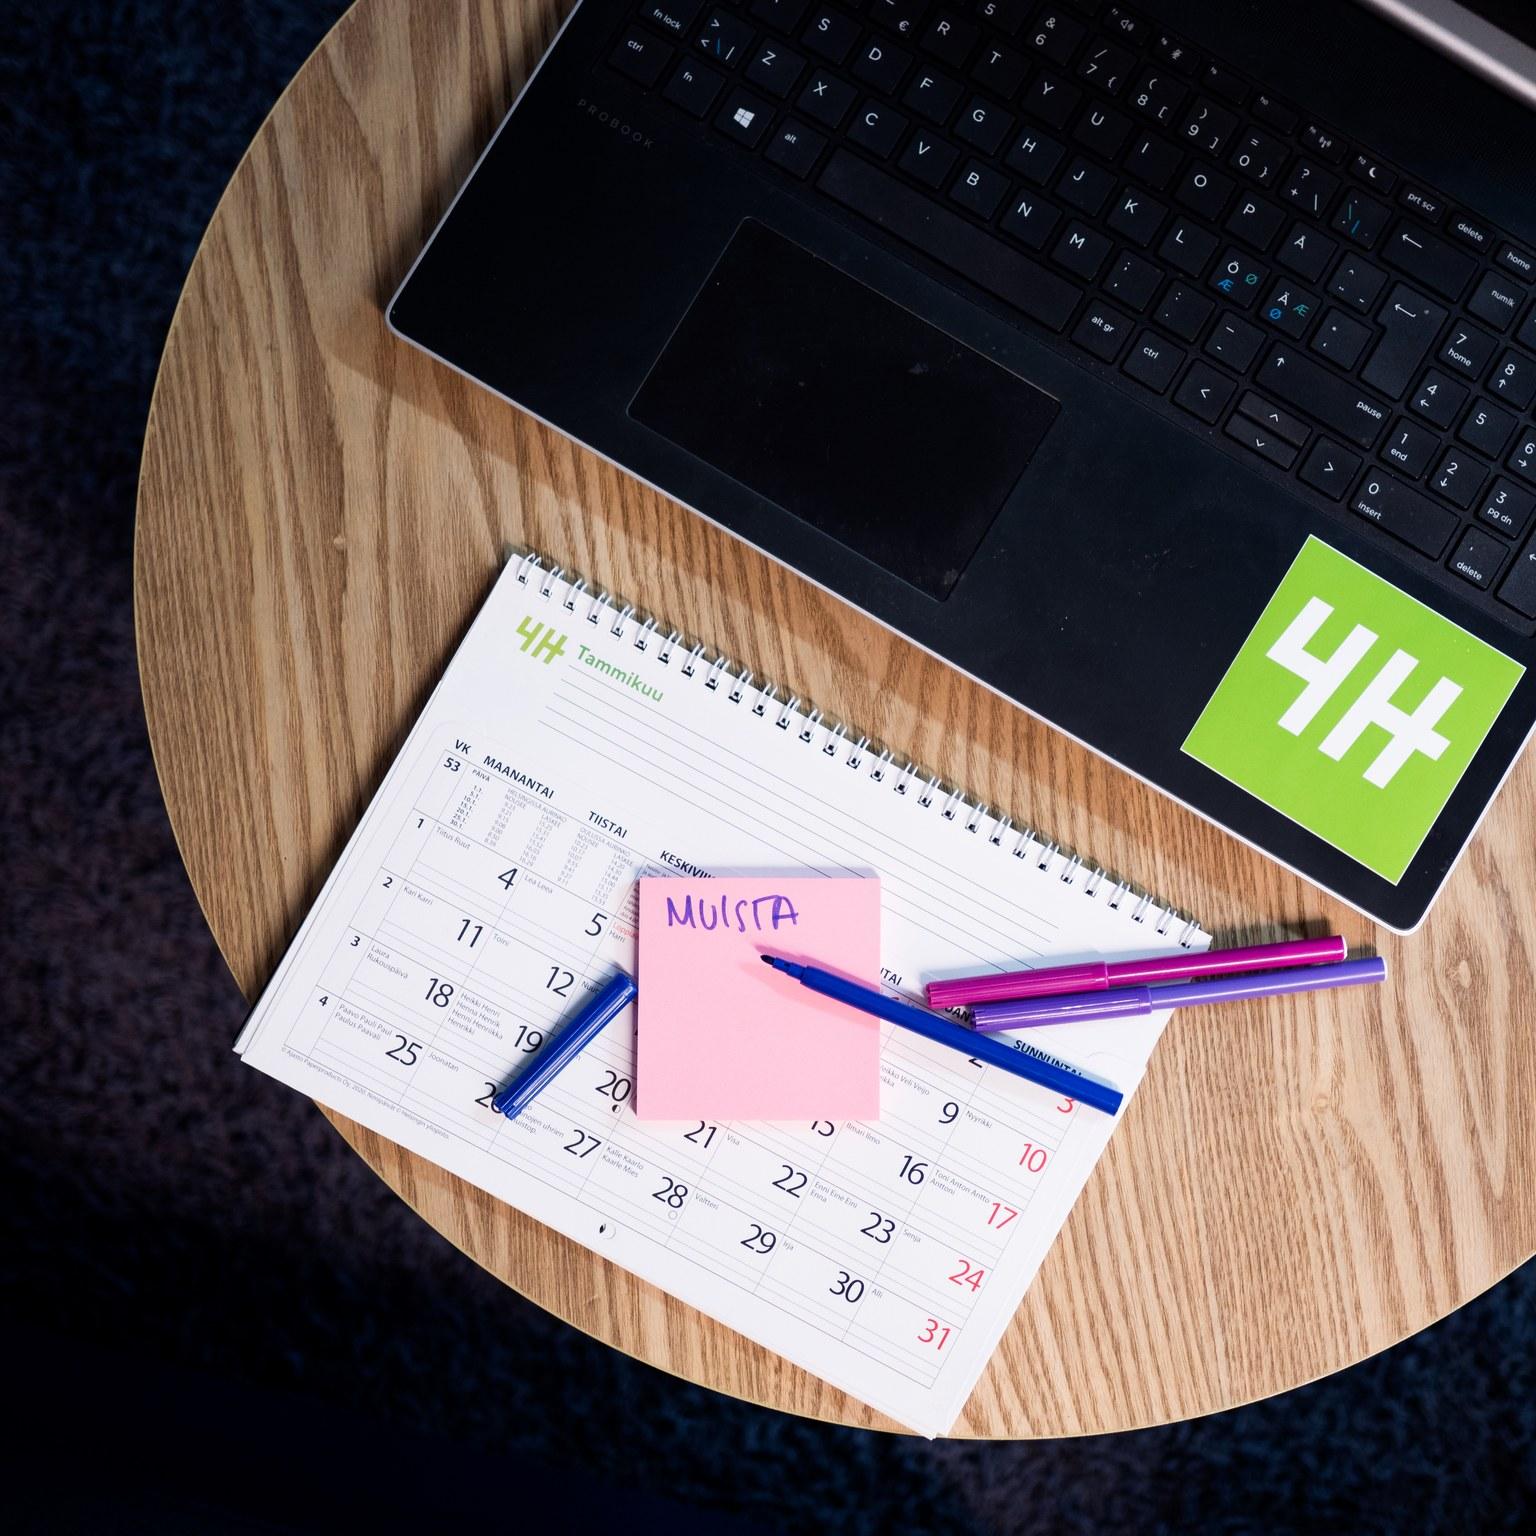 Kalenteri ja muistilappu